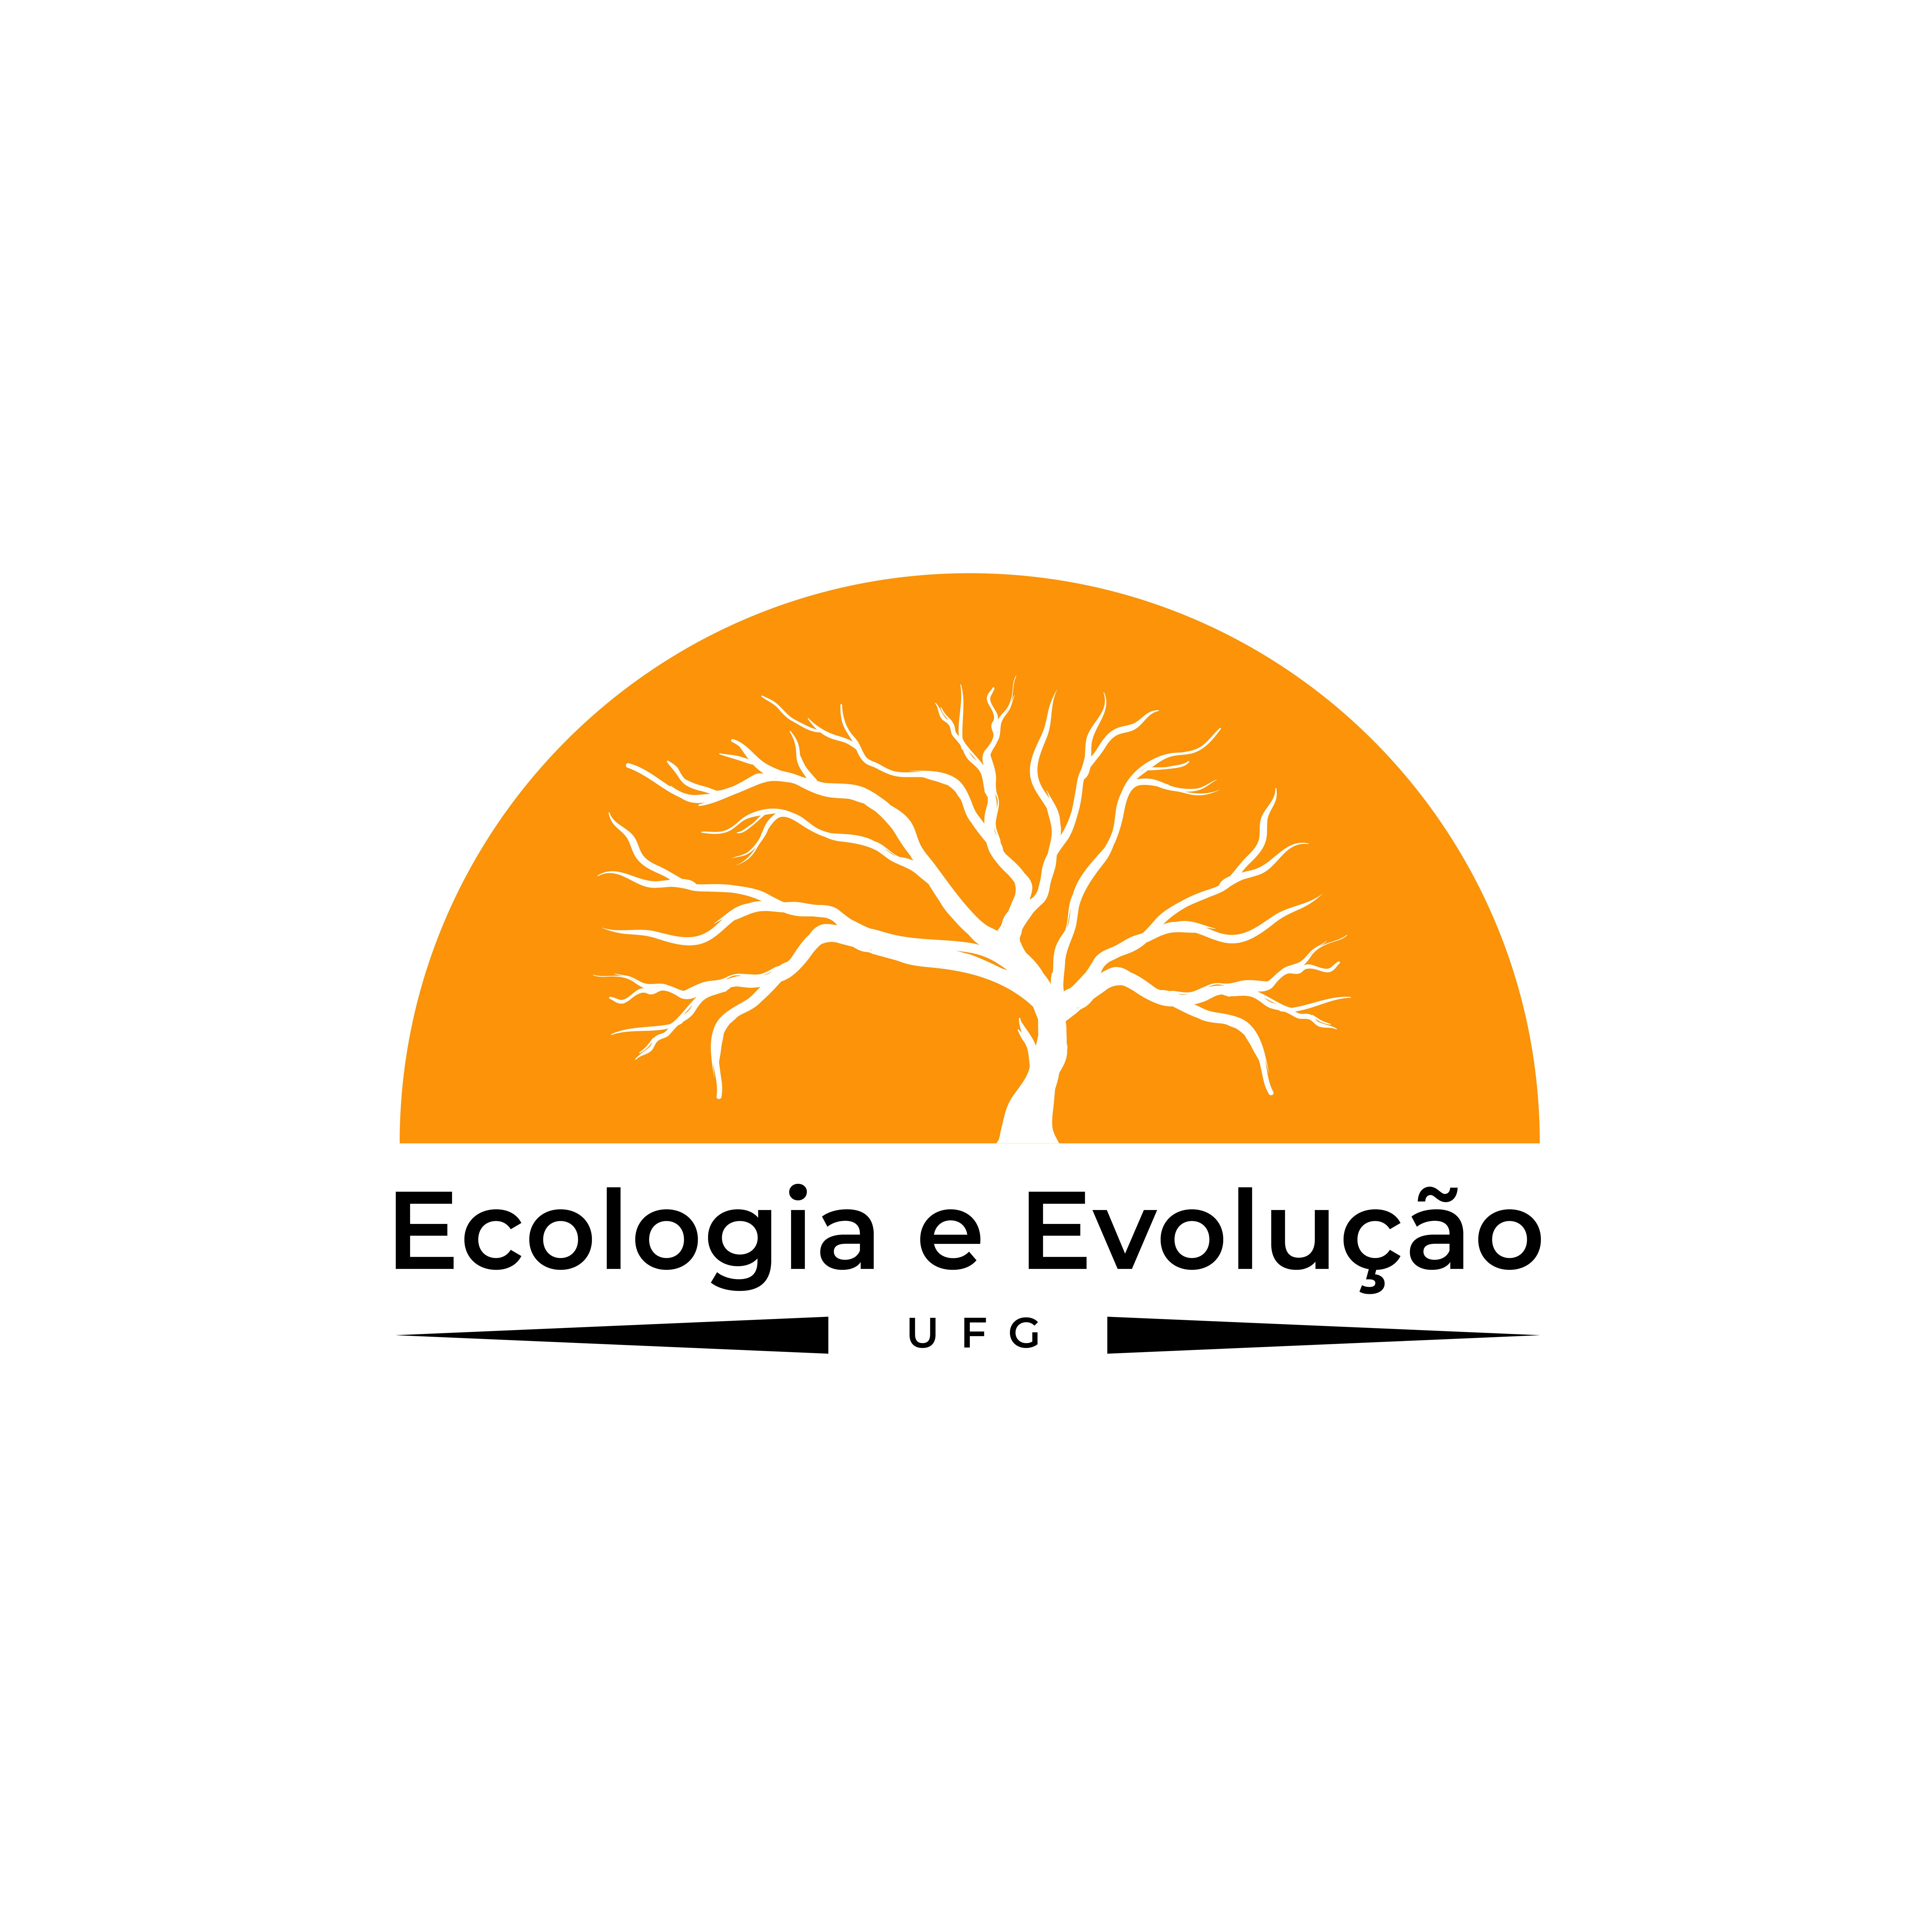 cassia carvalho aus latex